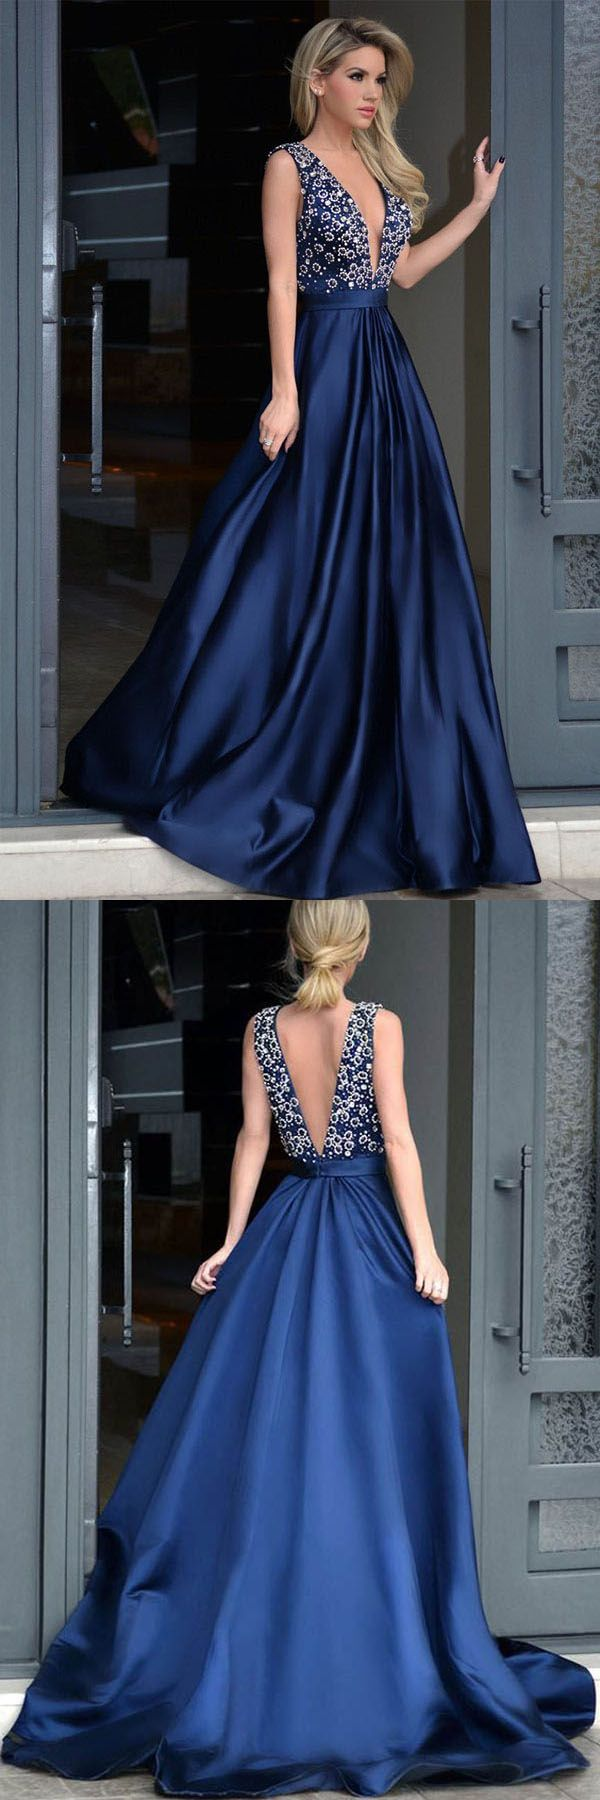 V-neck Royal Blue Satin Beading Prom Dresses With Sweep Train PG443 #prom #dress #evening #fashion #promdress #longprom #satin #pgmdress